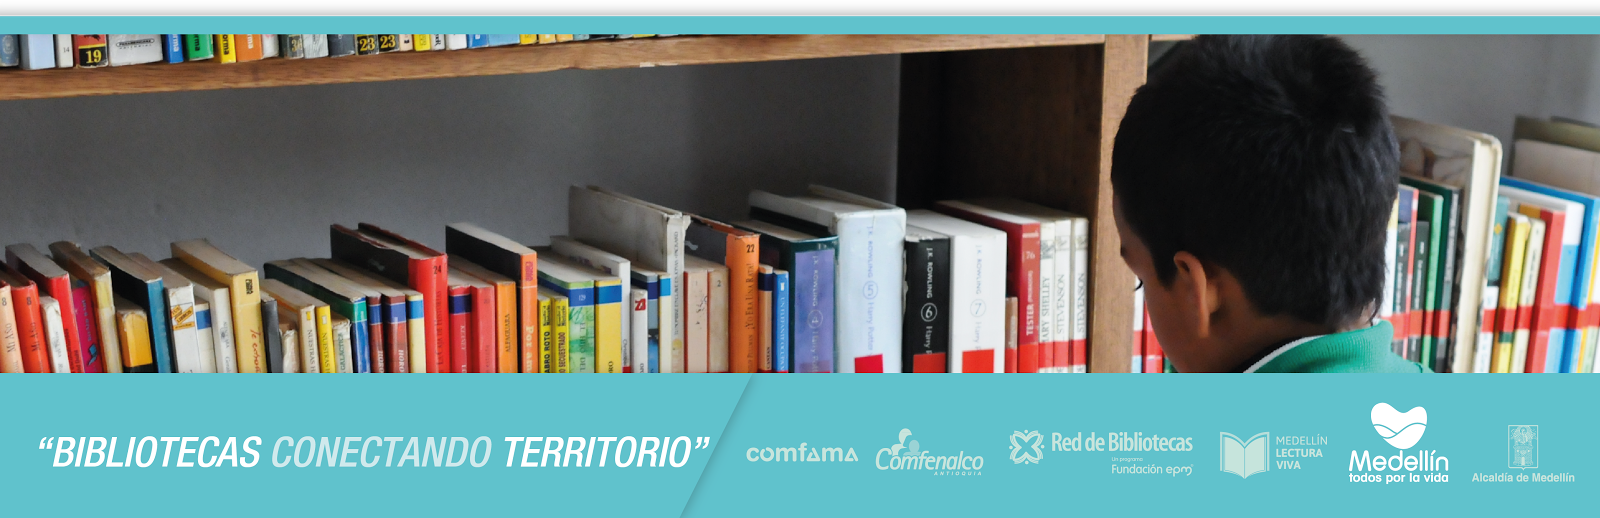 Biblioteca El Limonar